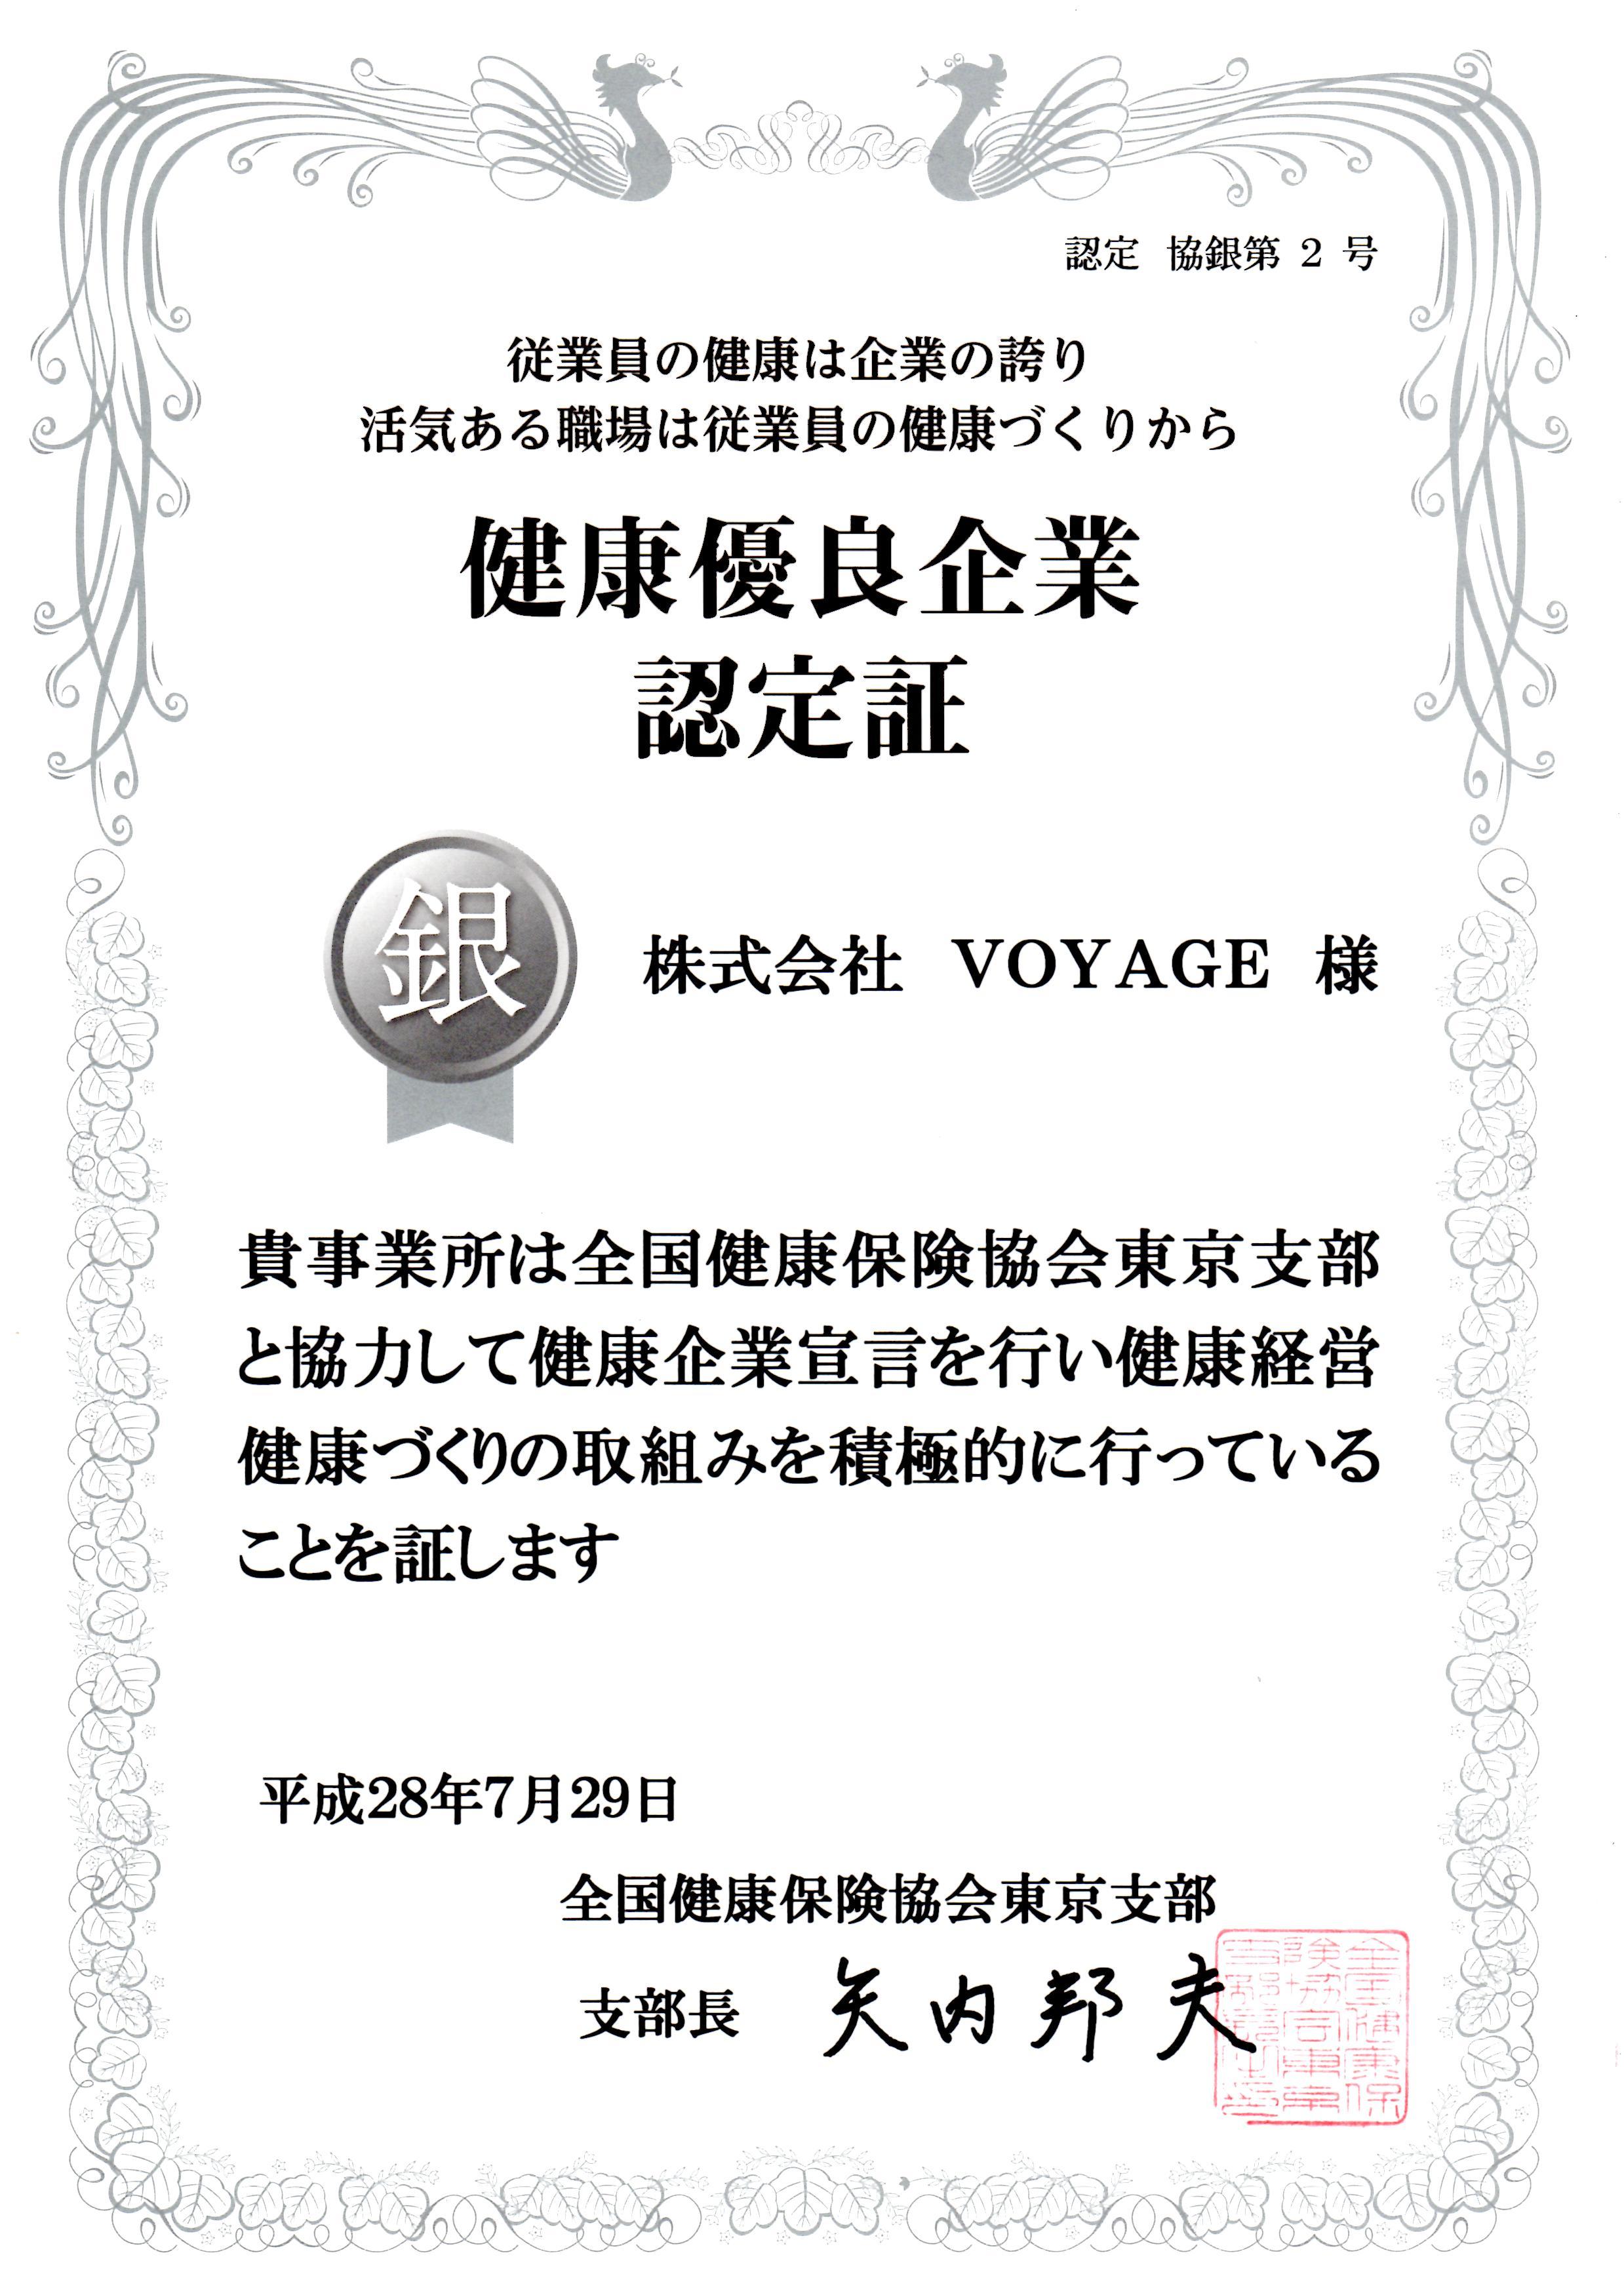 Voyage Infomation【全国健康保険協会 協会けんぽ/健康情報WEB 3月号 】に再登場!